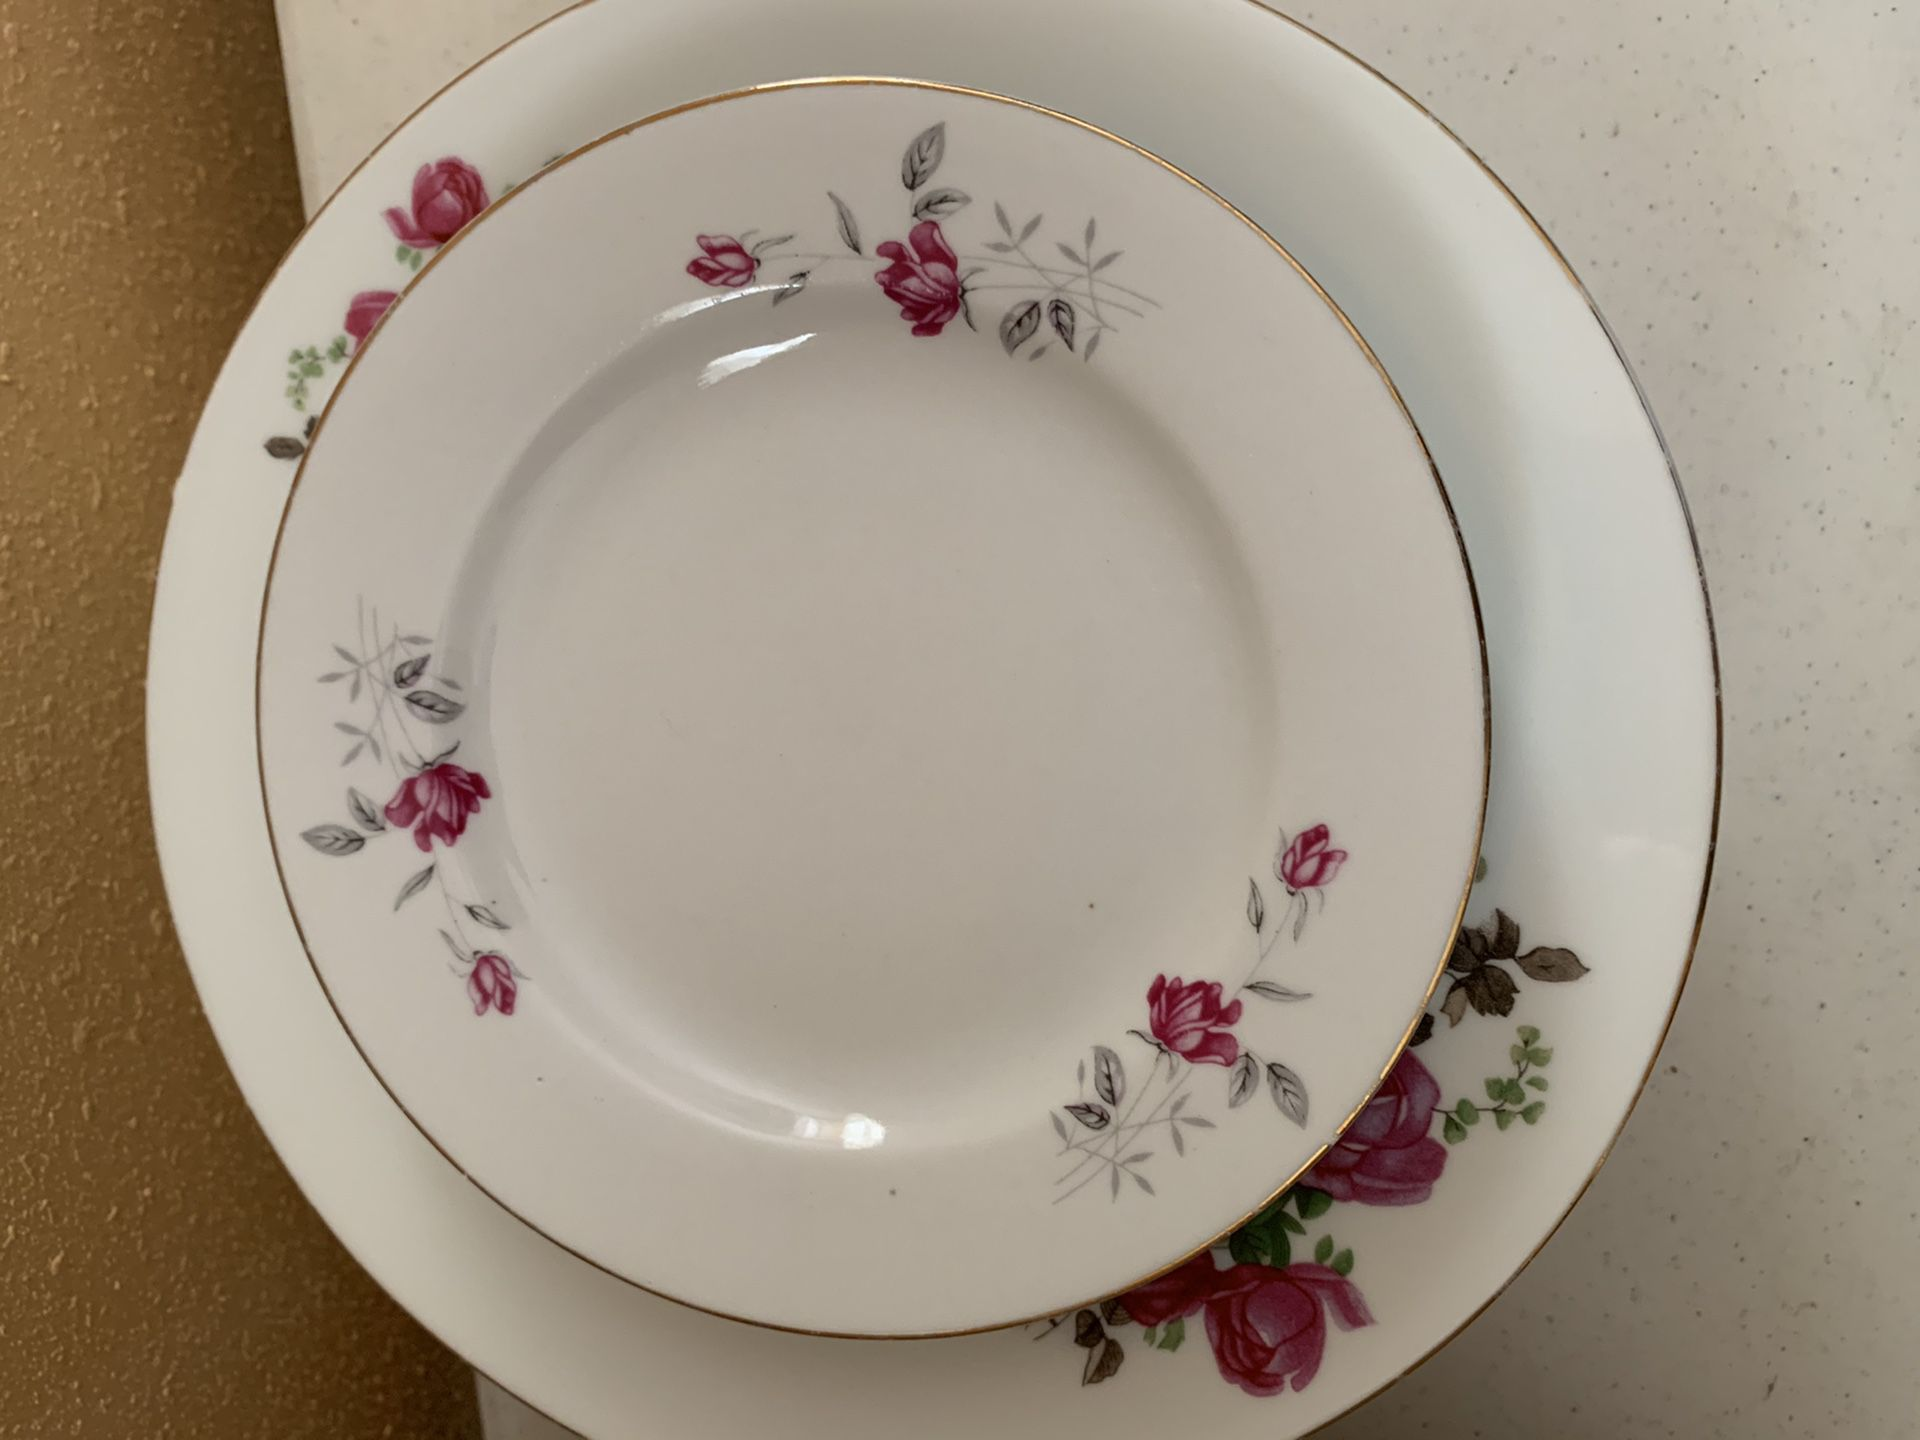 Accent chinaware